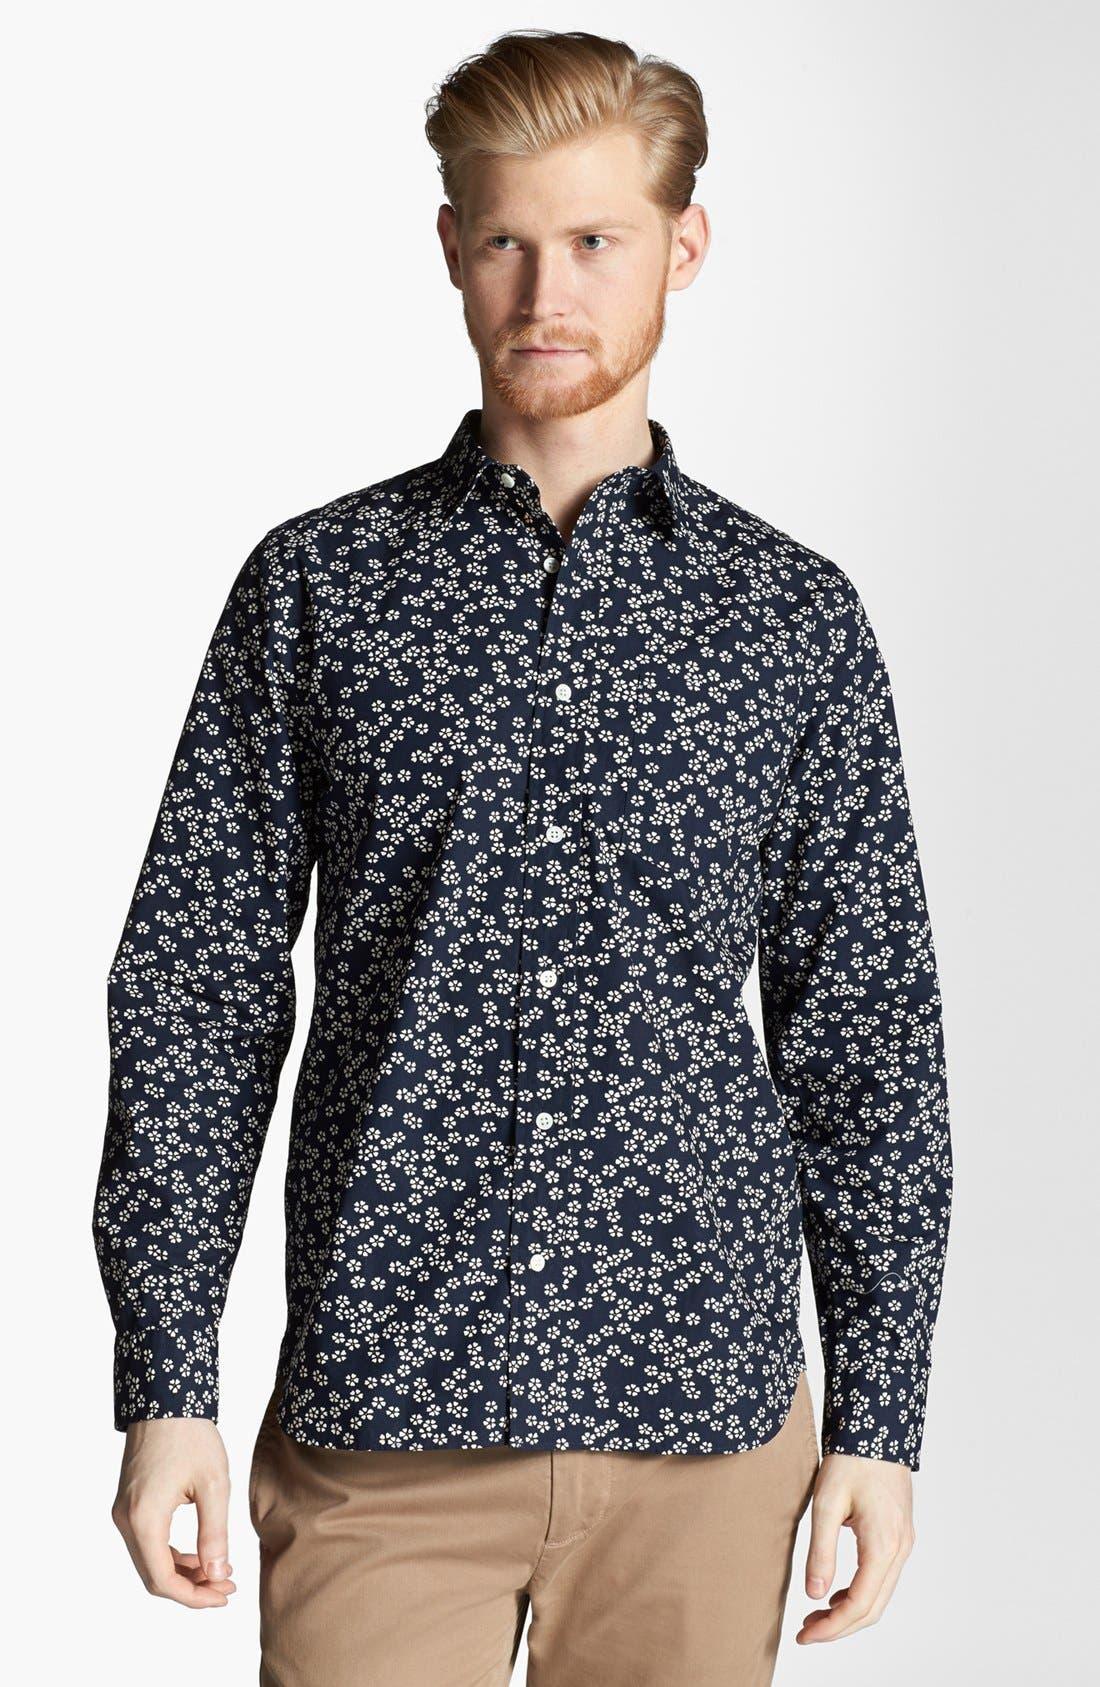 Main Image - Jack Spade 'Foley' Floral Print Woven Shirt